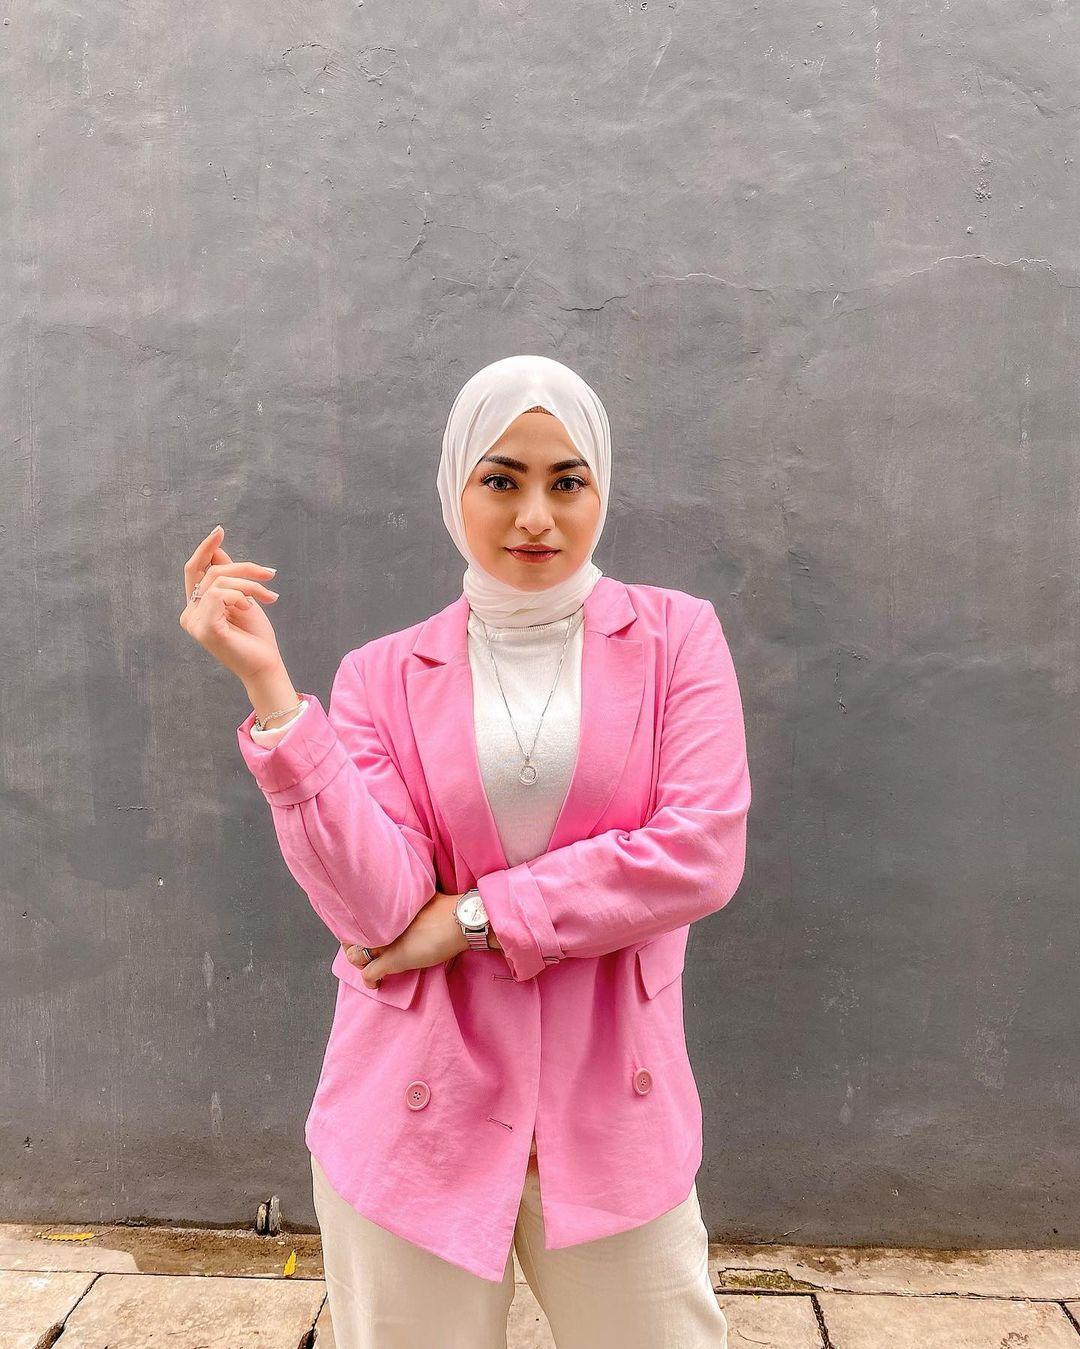 Deretan Gaya Artis Mualaf yang Putuskan Pakai Hijab, Menyejukkan Hati!